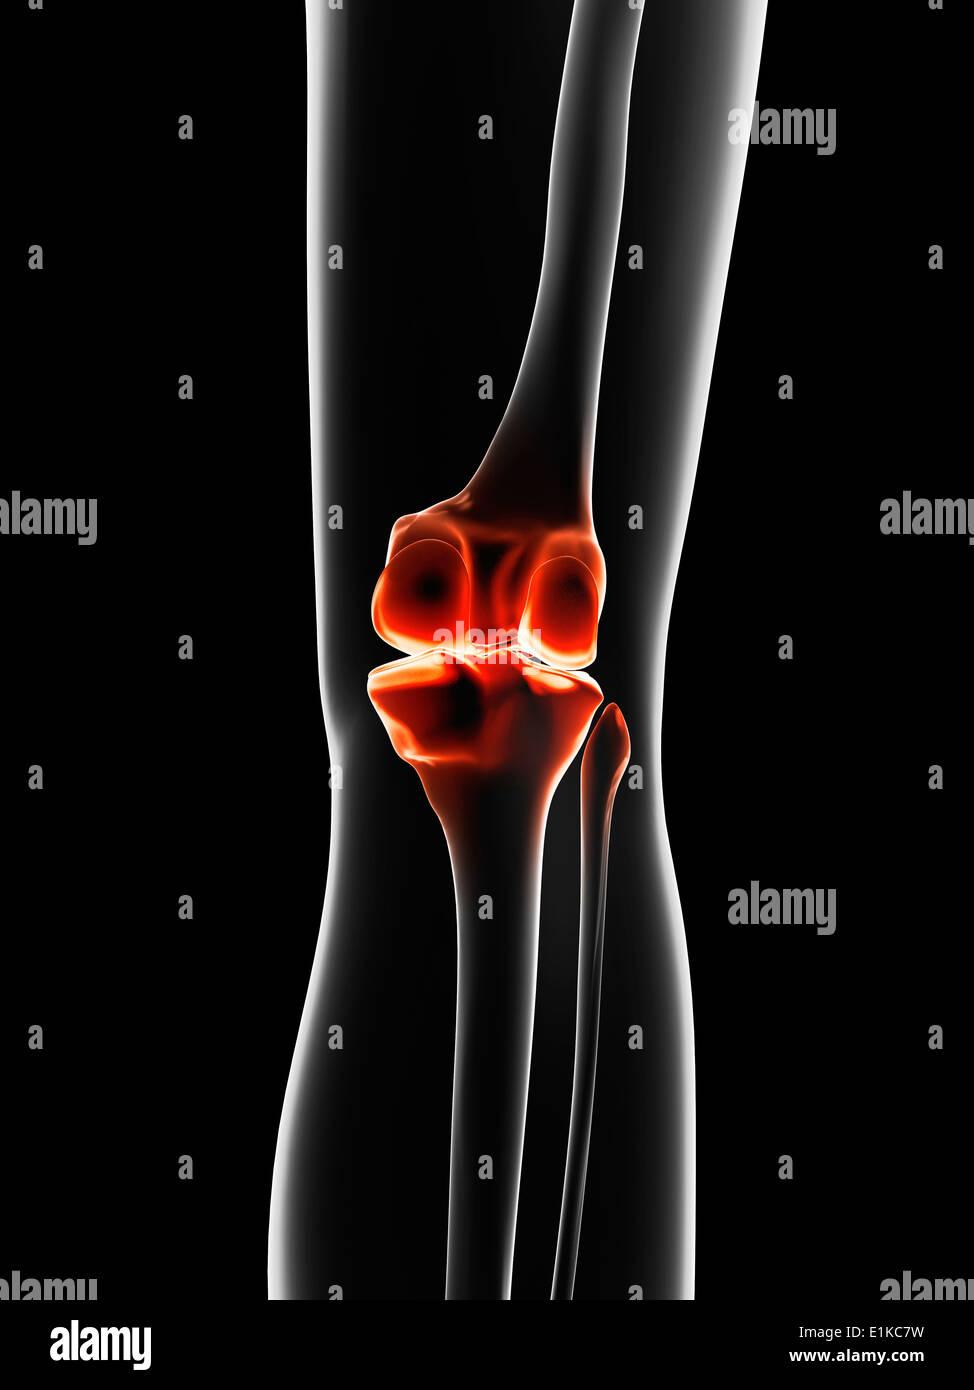 Human knee joint computer artwork. Stock Photo